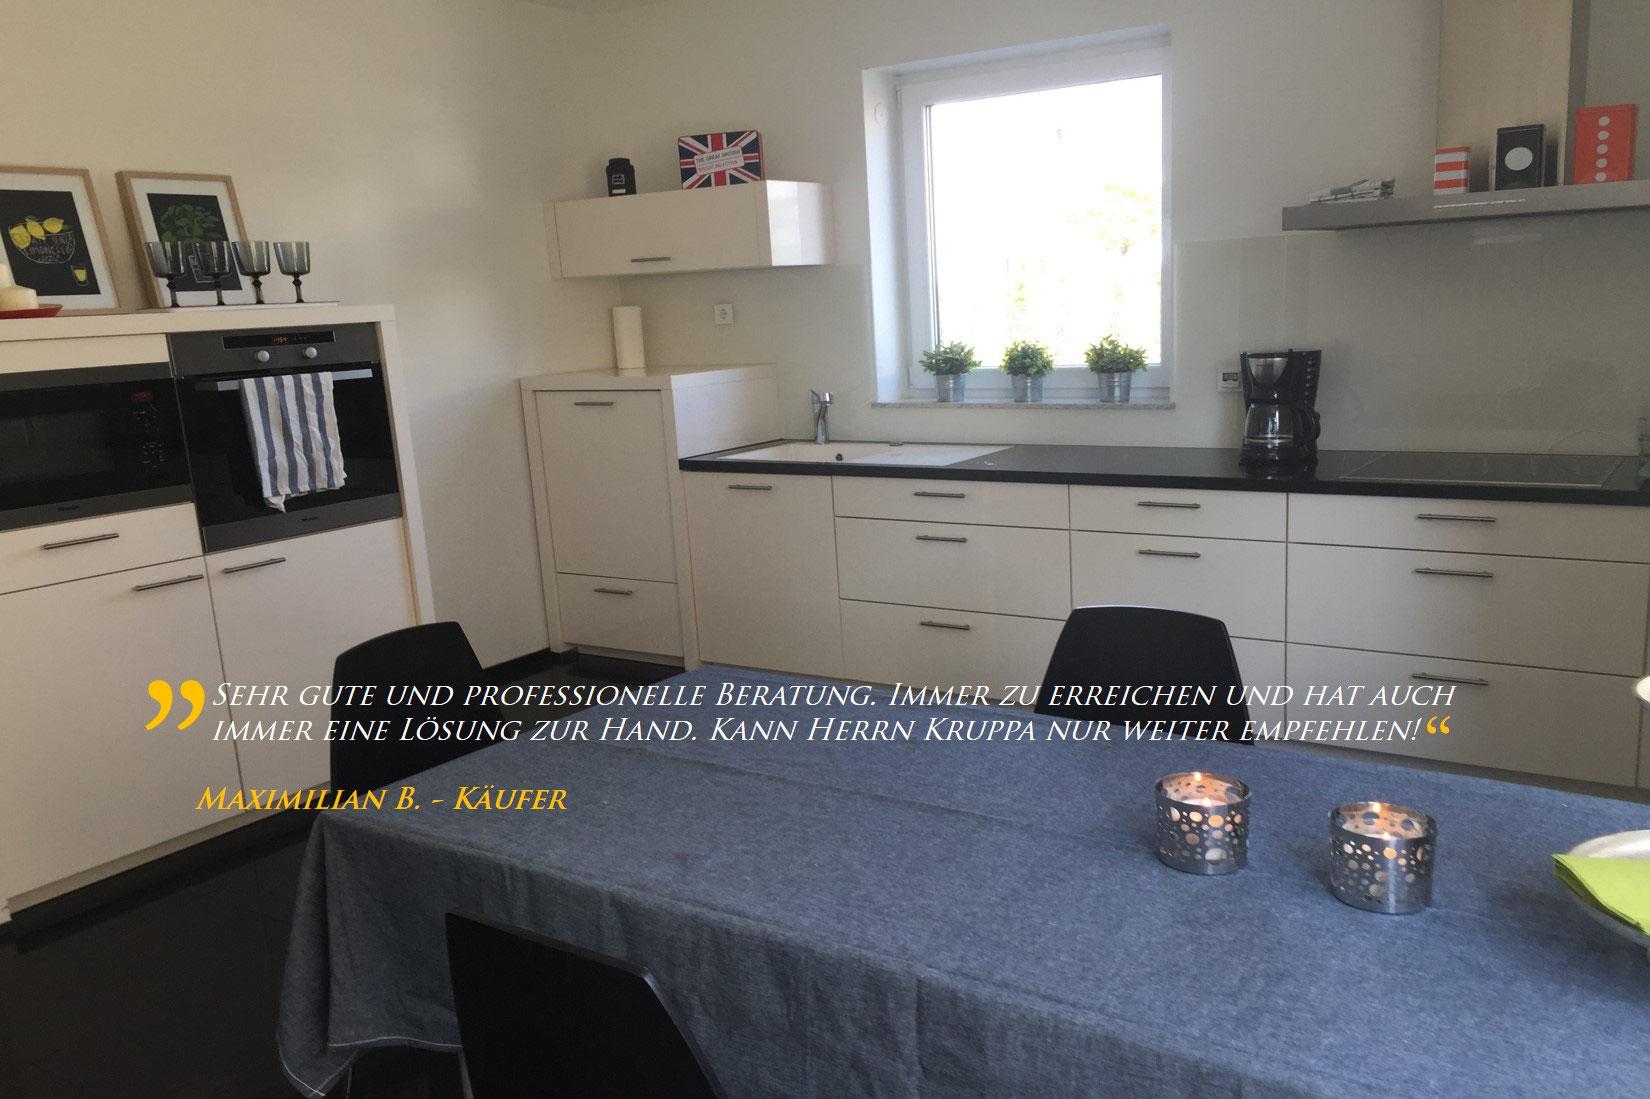 start object plus immobilien eine gute idee f r ihre immobilie. Black Bedroom Furniture Sets. Home Design Ideas